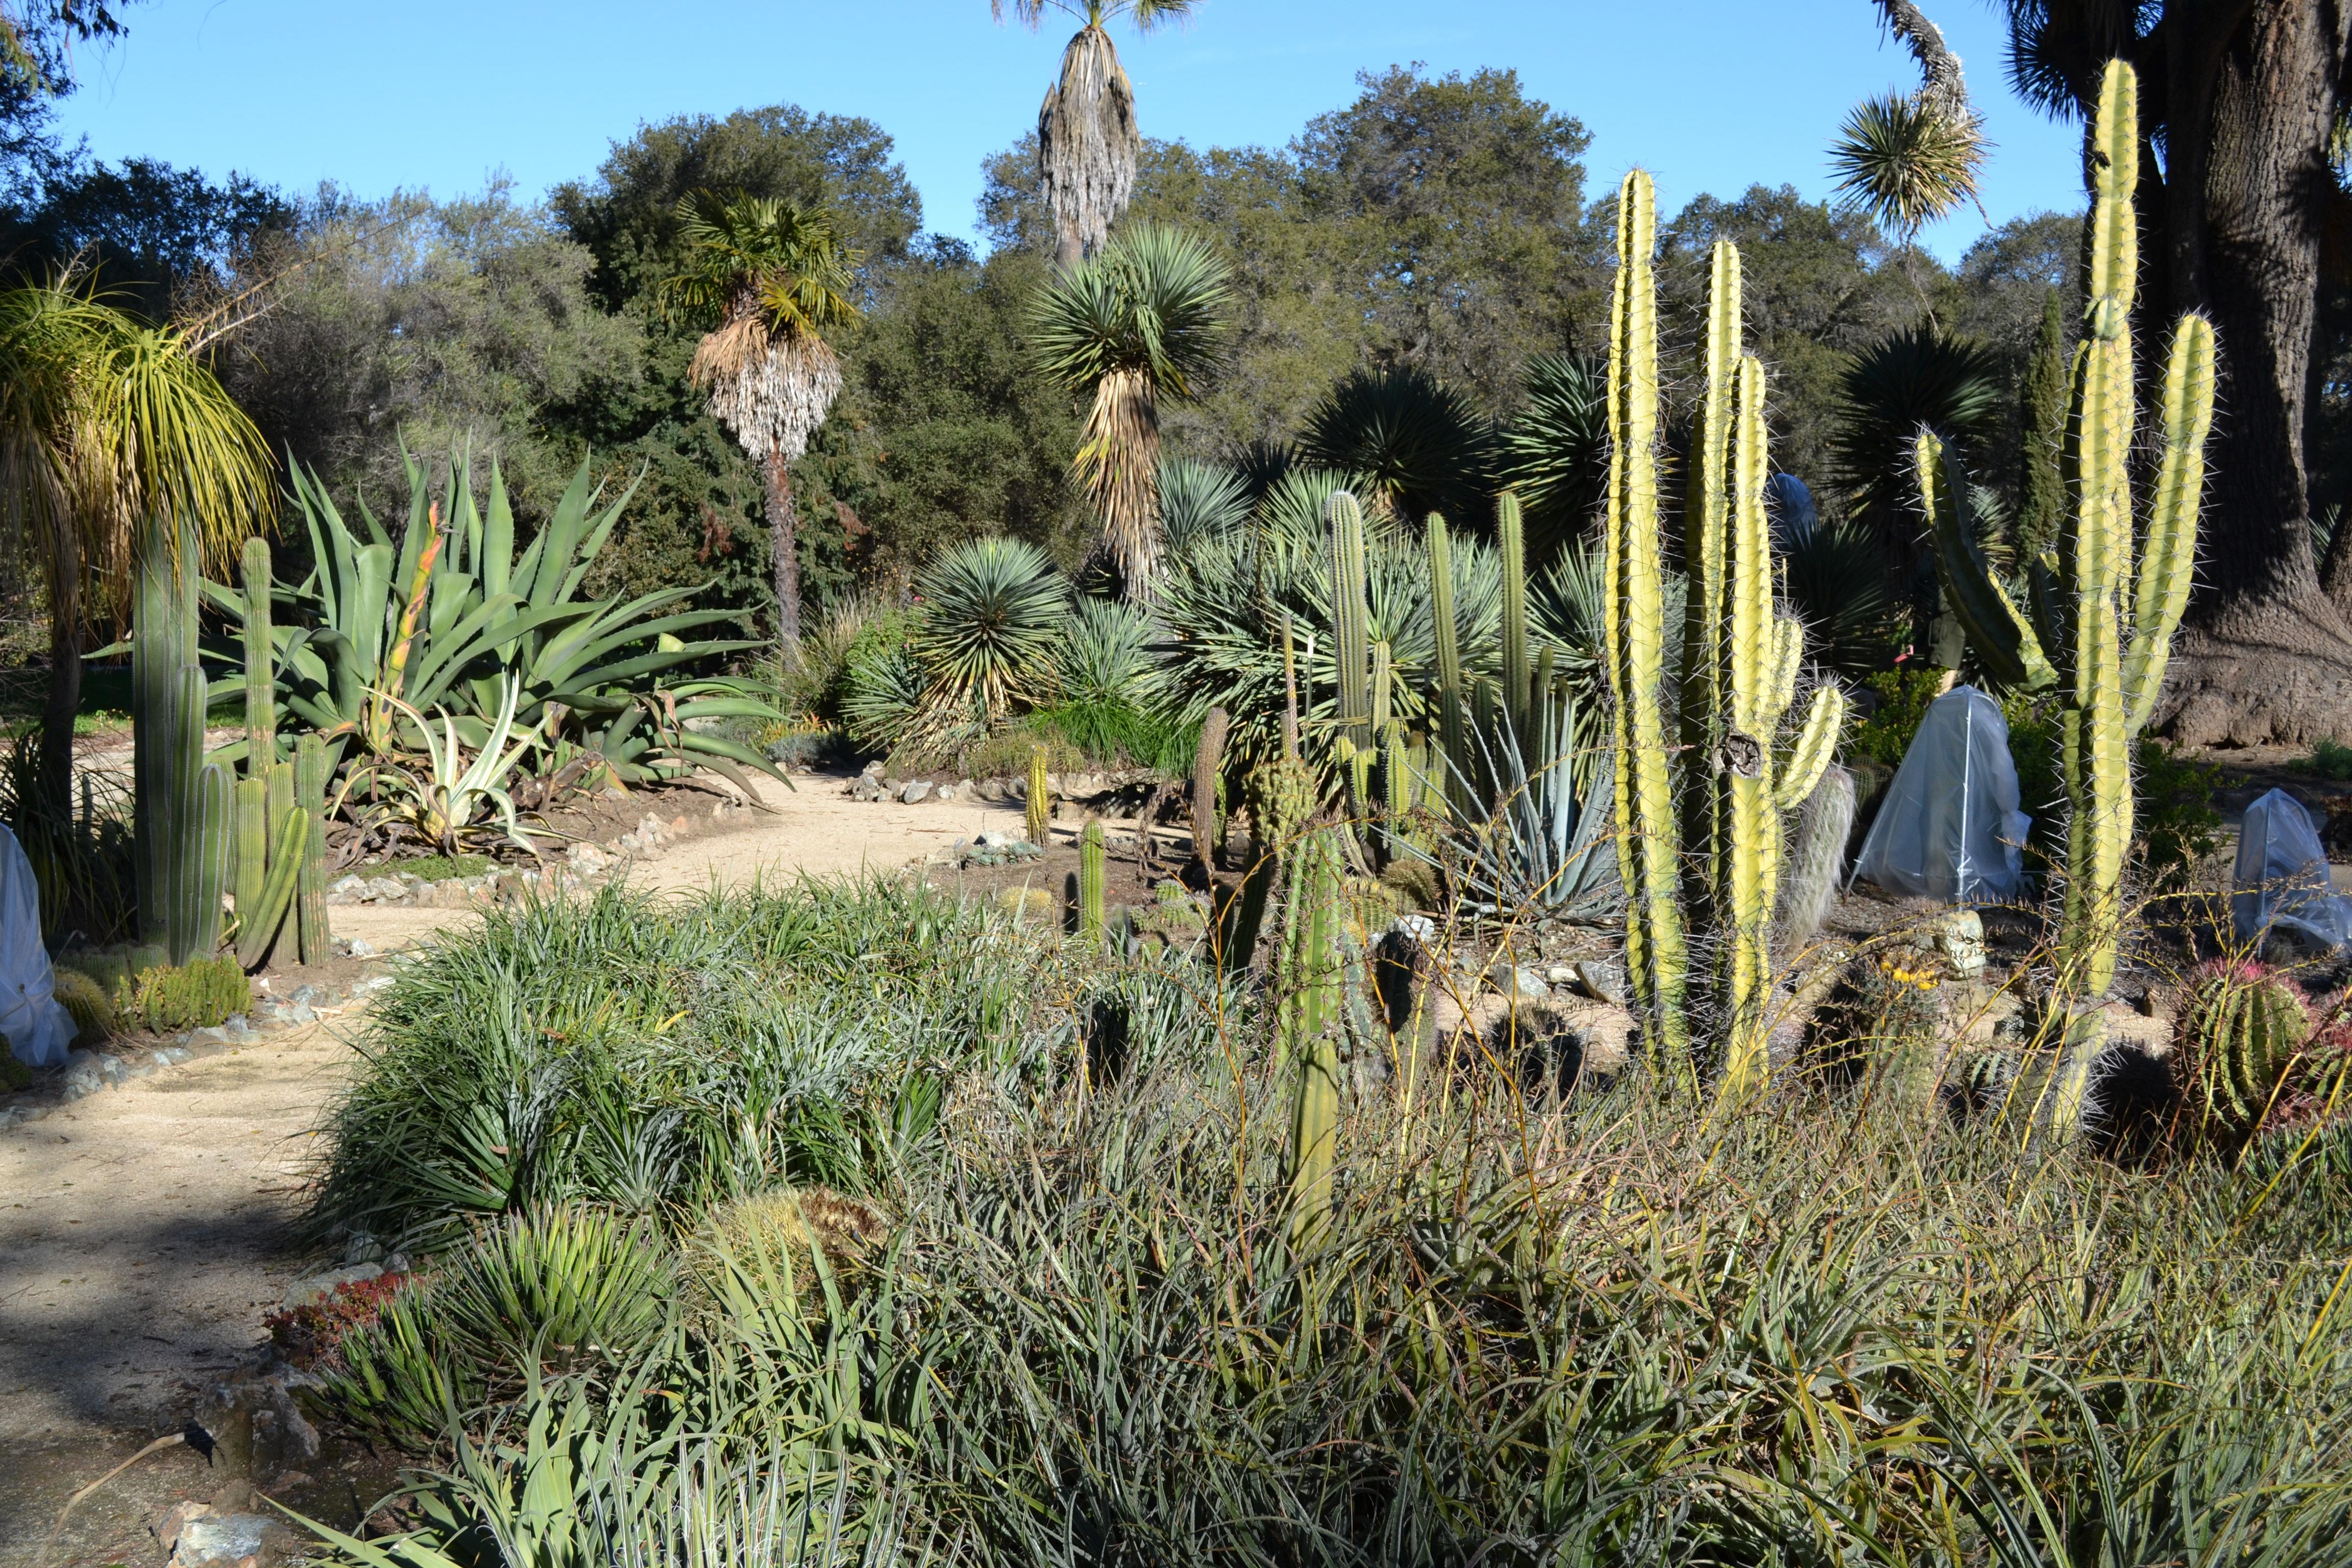 Exceptionnel File:Arizona Cactus Garden At Stanford University 6.JPG